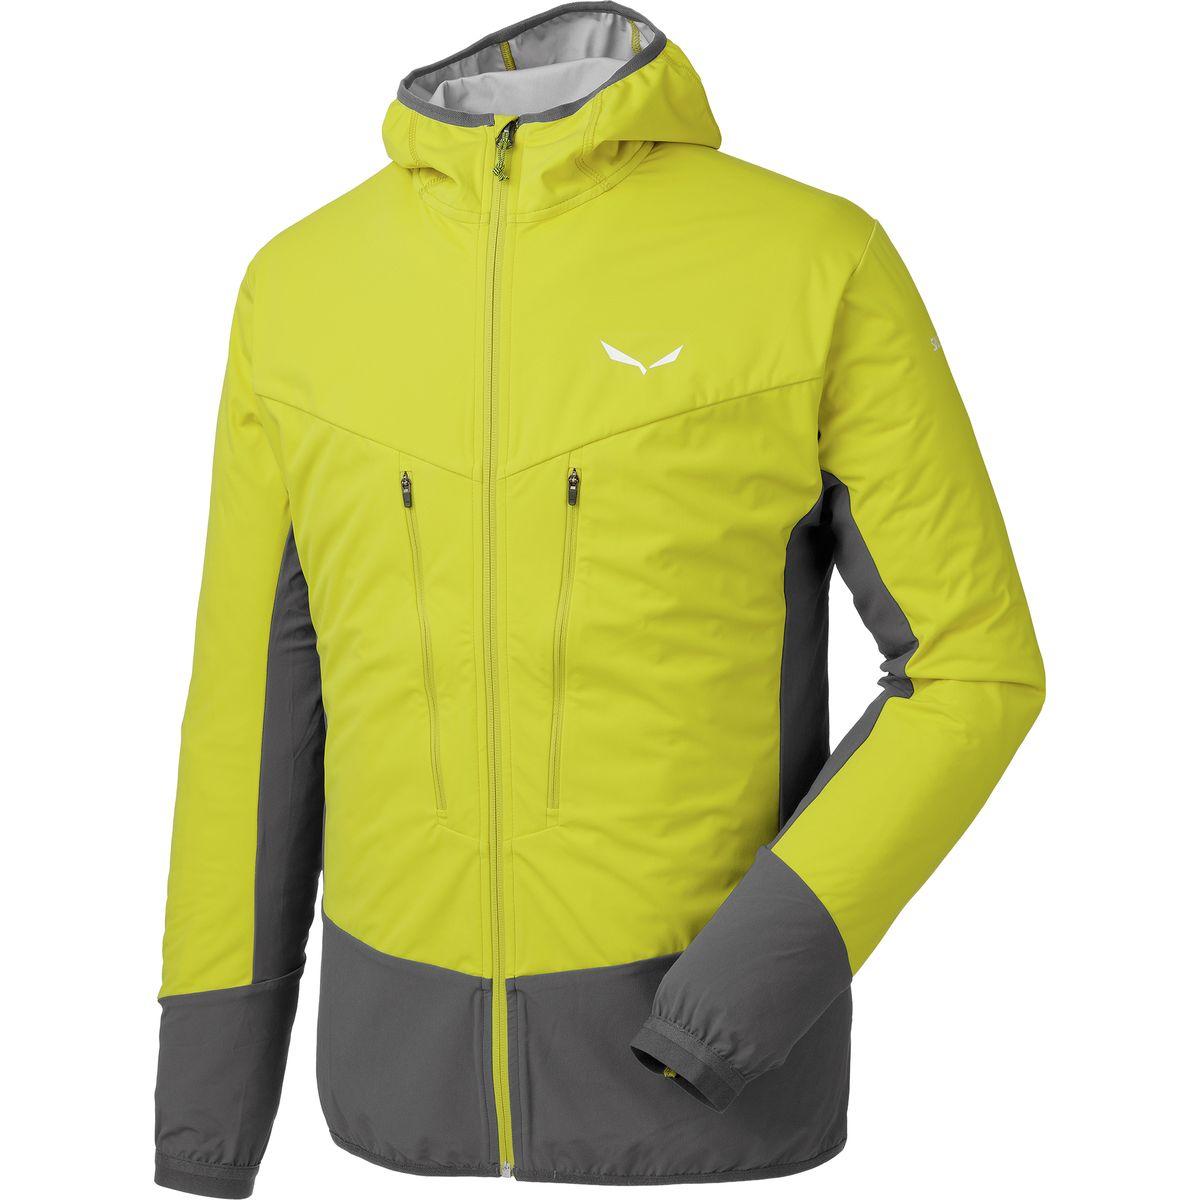 Pedroc Hybrid Hooded Softshell Jacket - Men